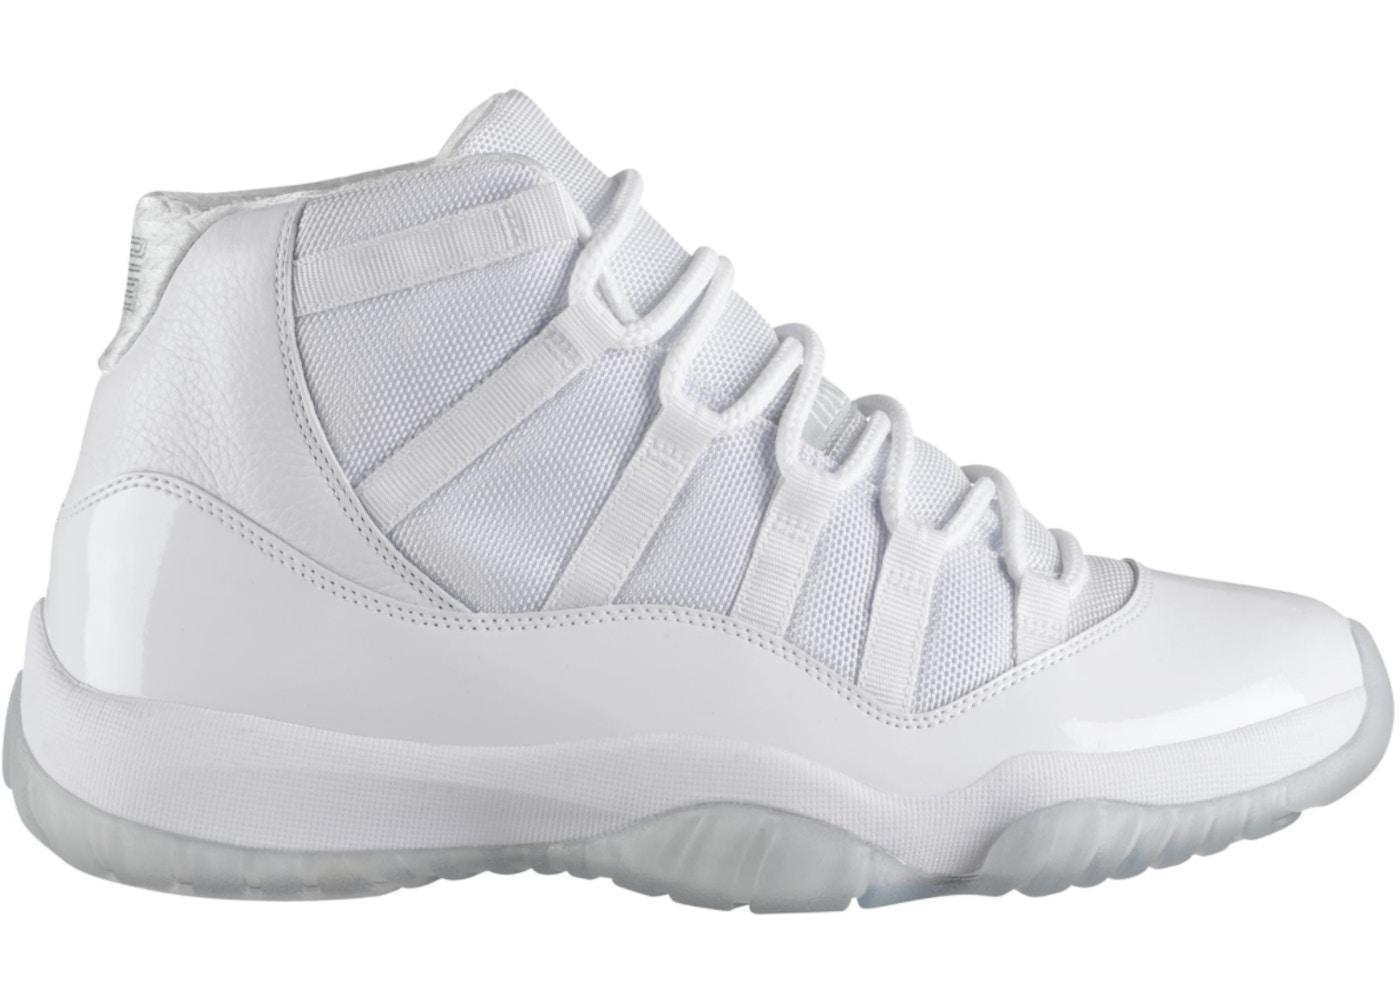 Jordan 11 Retro Silver Anniversary (GS)